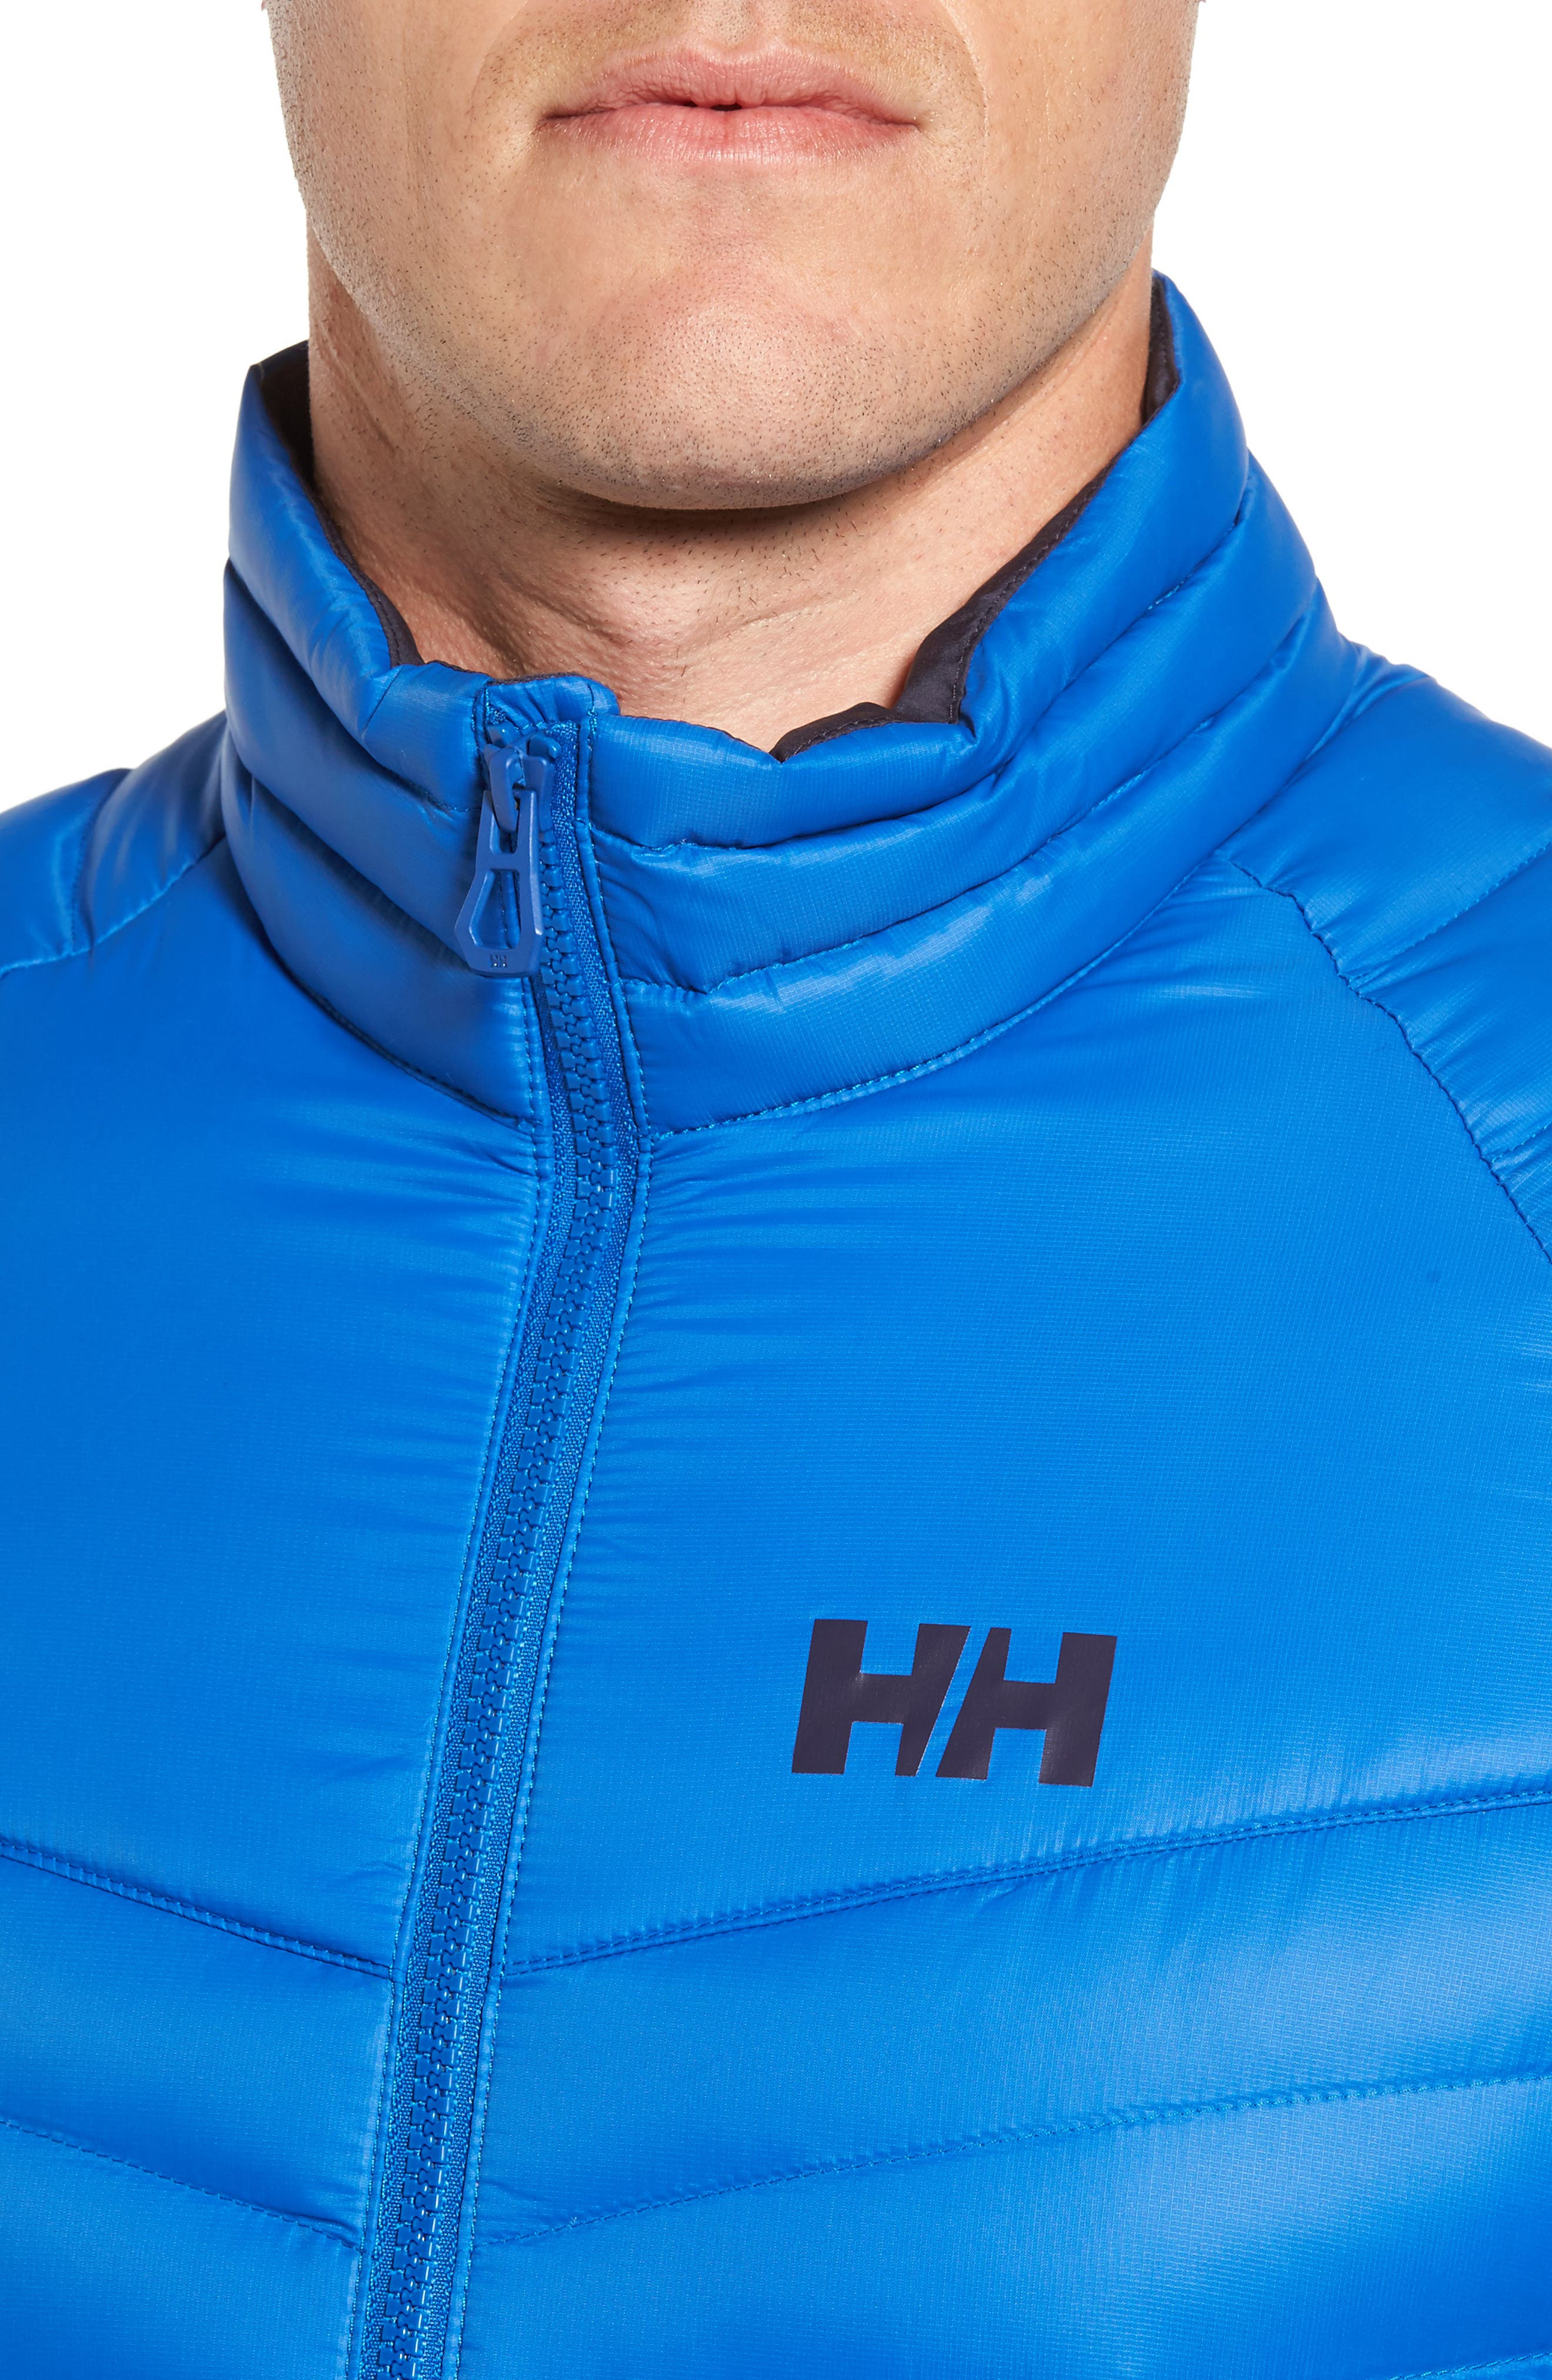 Verglas Insulator Hybrid Jacket,                             Alternate thumbnail 4, color,                             563 Olympian Blue